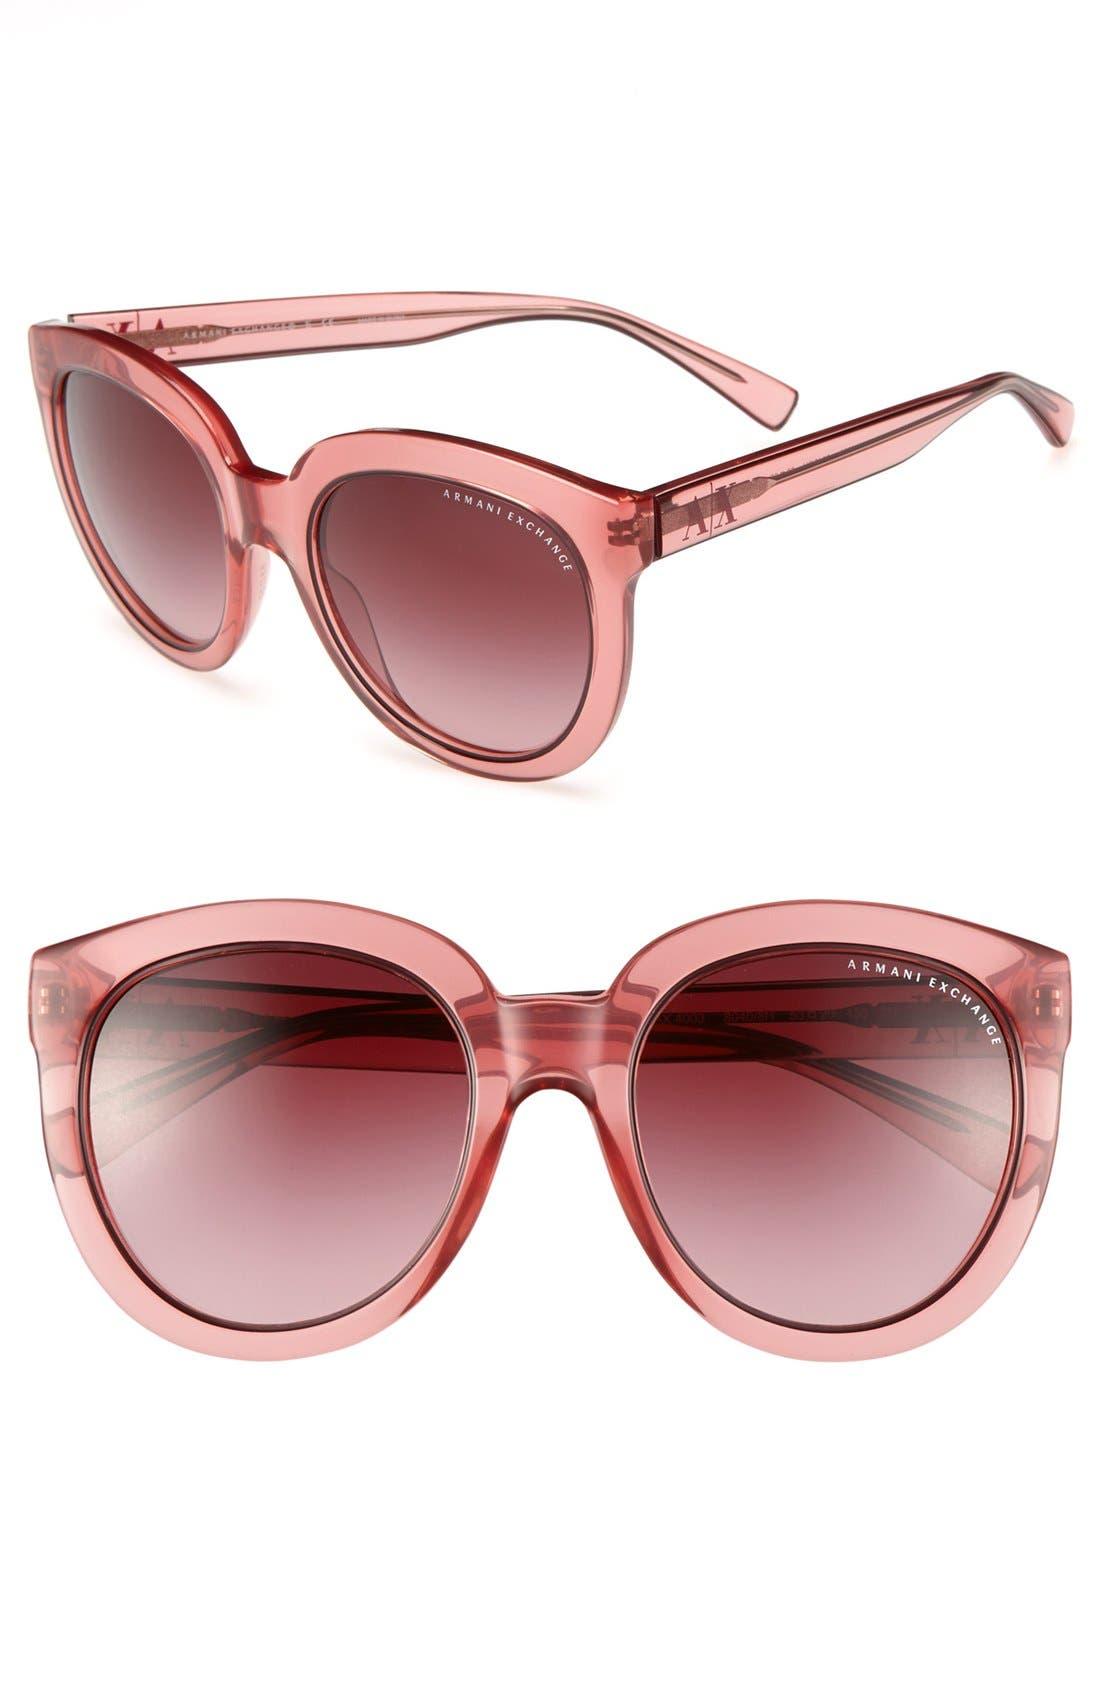 Main Image - AX Armani Exchange 'Transparent Glam' 53mm Sunglasses